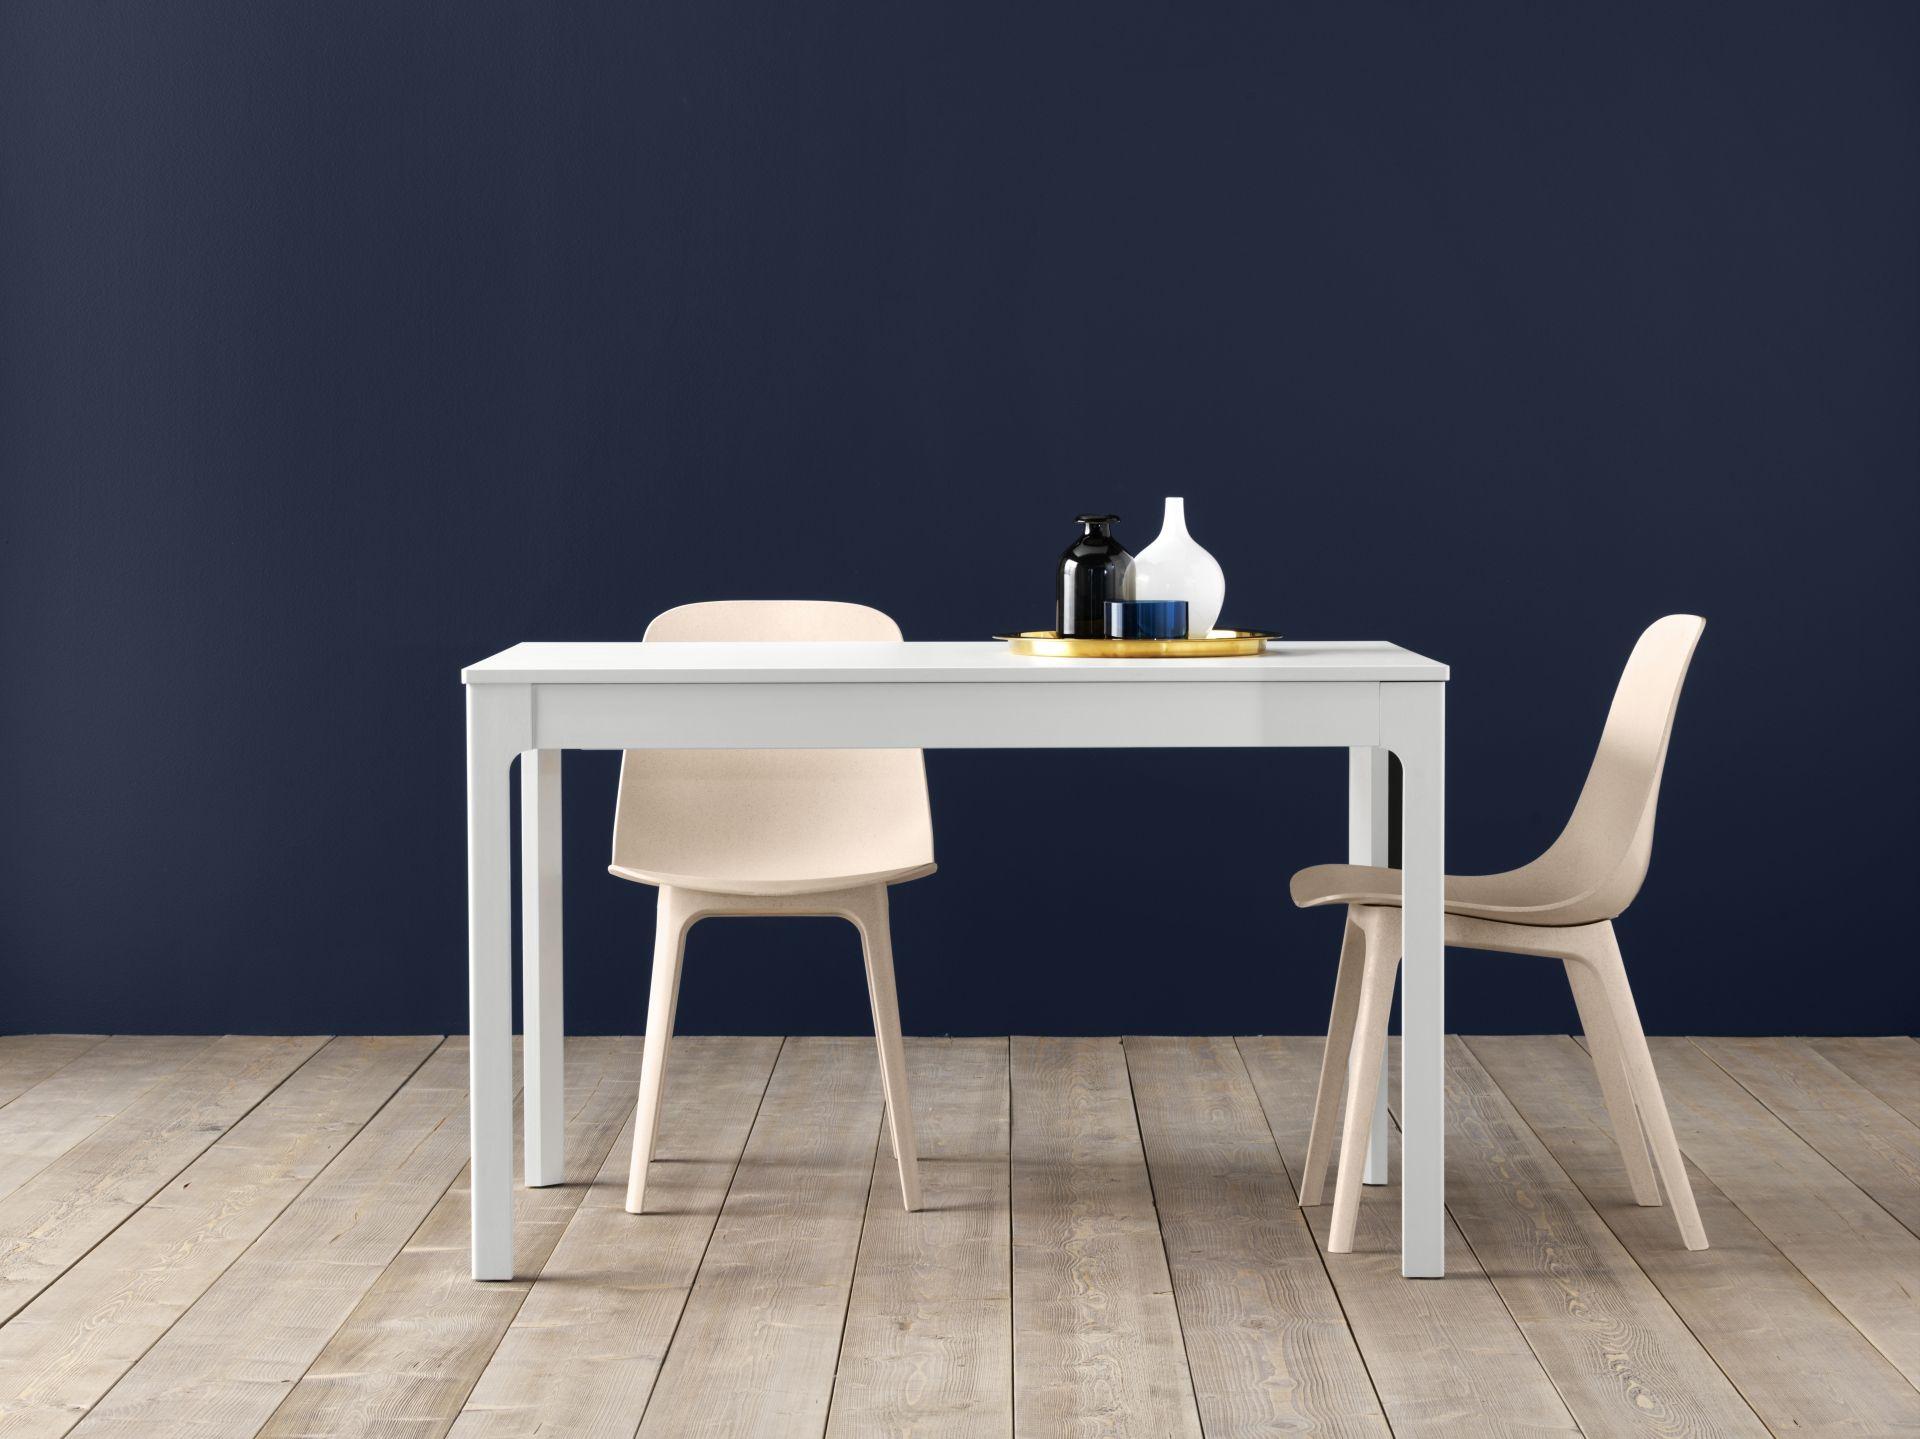 Ikea Stoel Wit : Odger eetkamerstoel ikea ikeanl ikeanederland designdroom